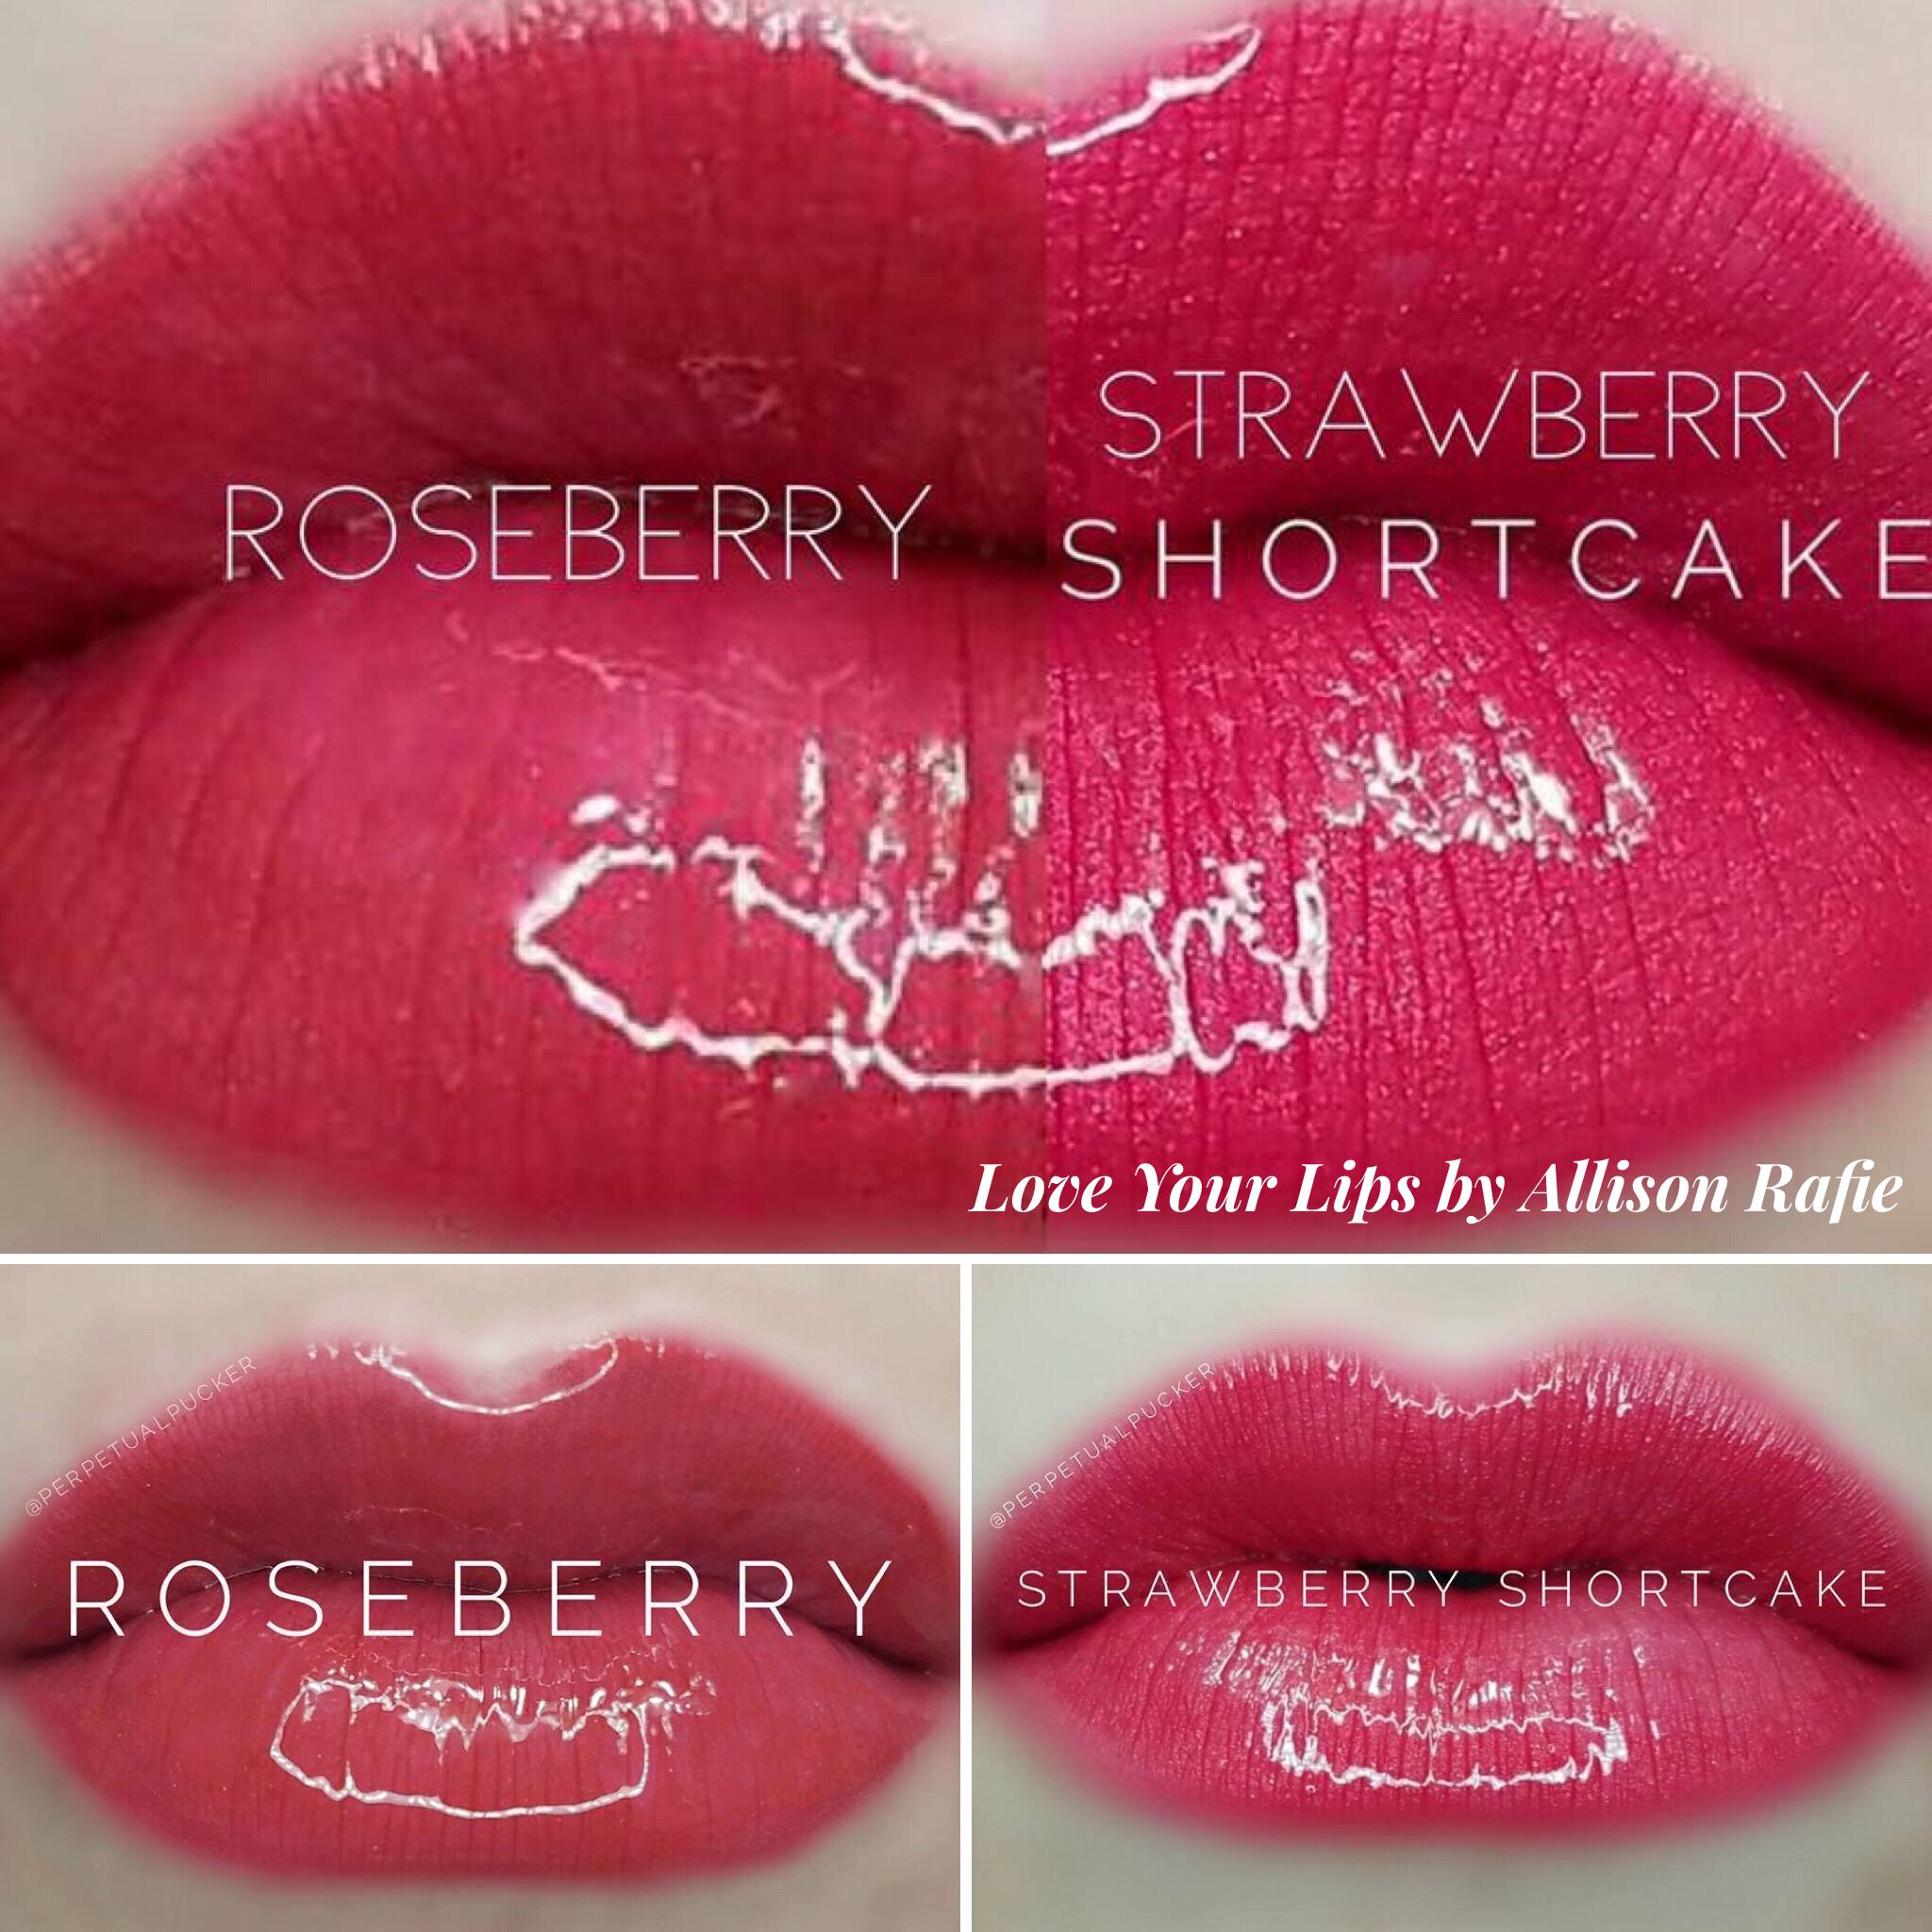 Roseberry vs Strawberry Shortcake LipSense Distributer